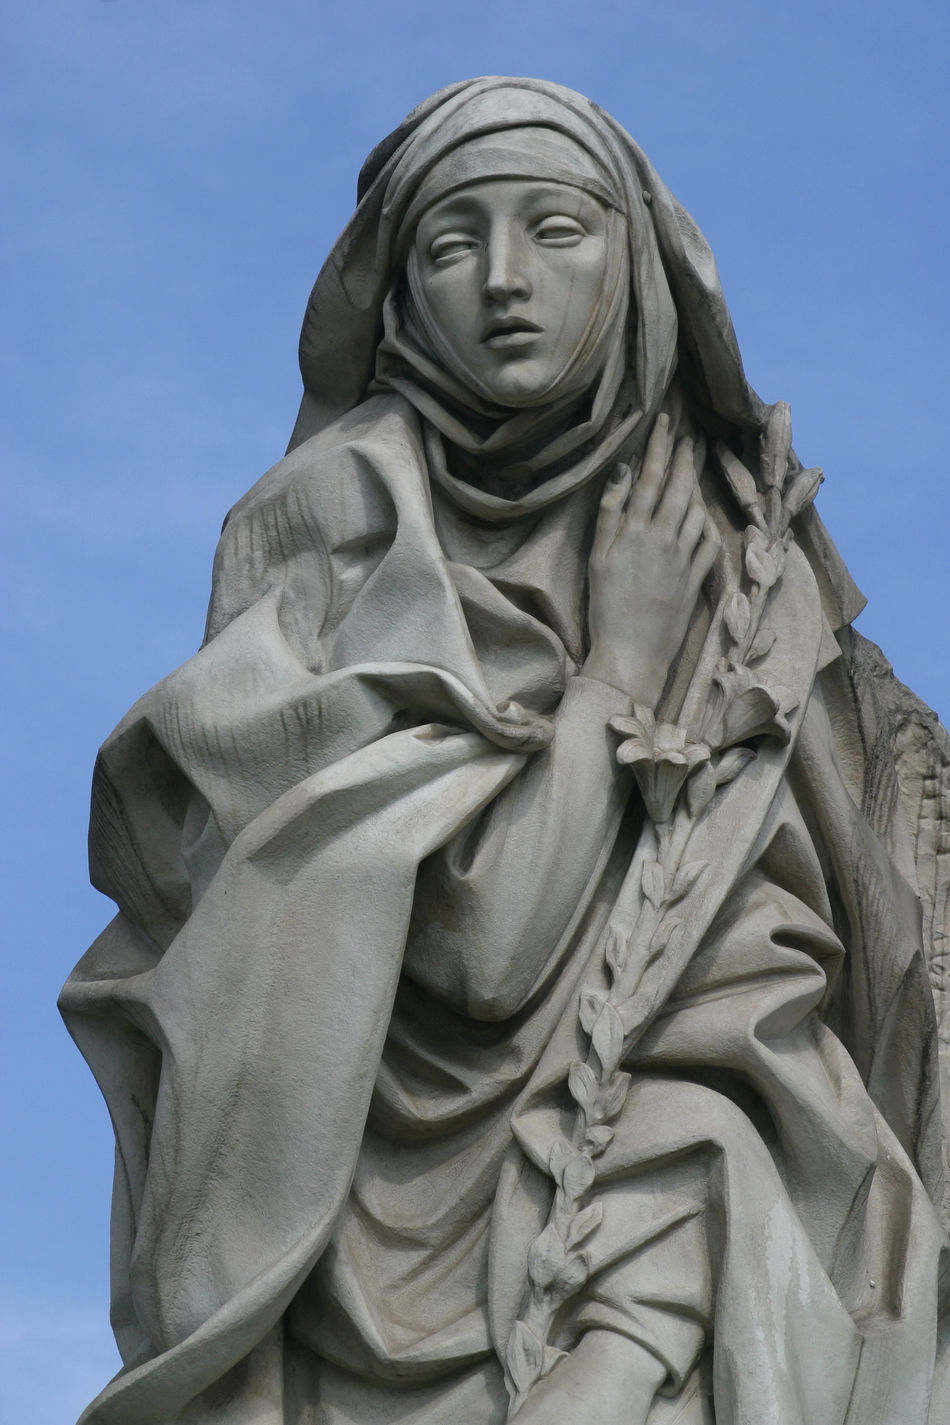 Saint Catherine of Siena, statue in Rome Art Catherine Catherine Of Siena Christianity Creativity Faith Historic Religion Rome Saint Sculpture Siena Statue